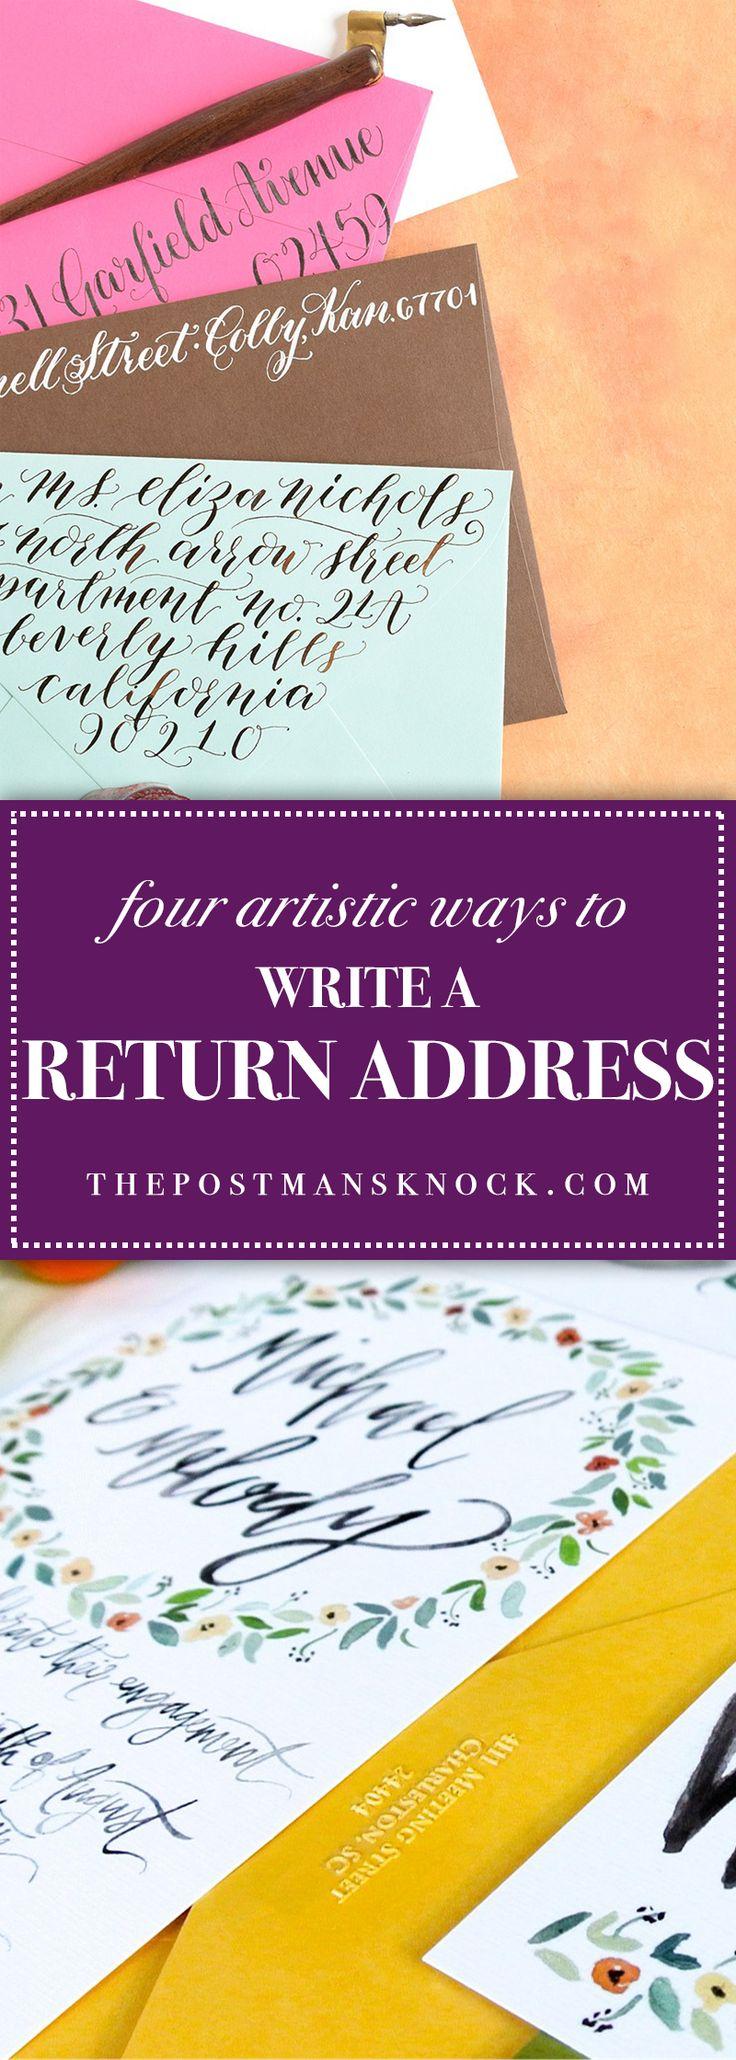 four artistic ways to write a return address  creative